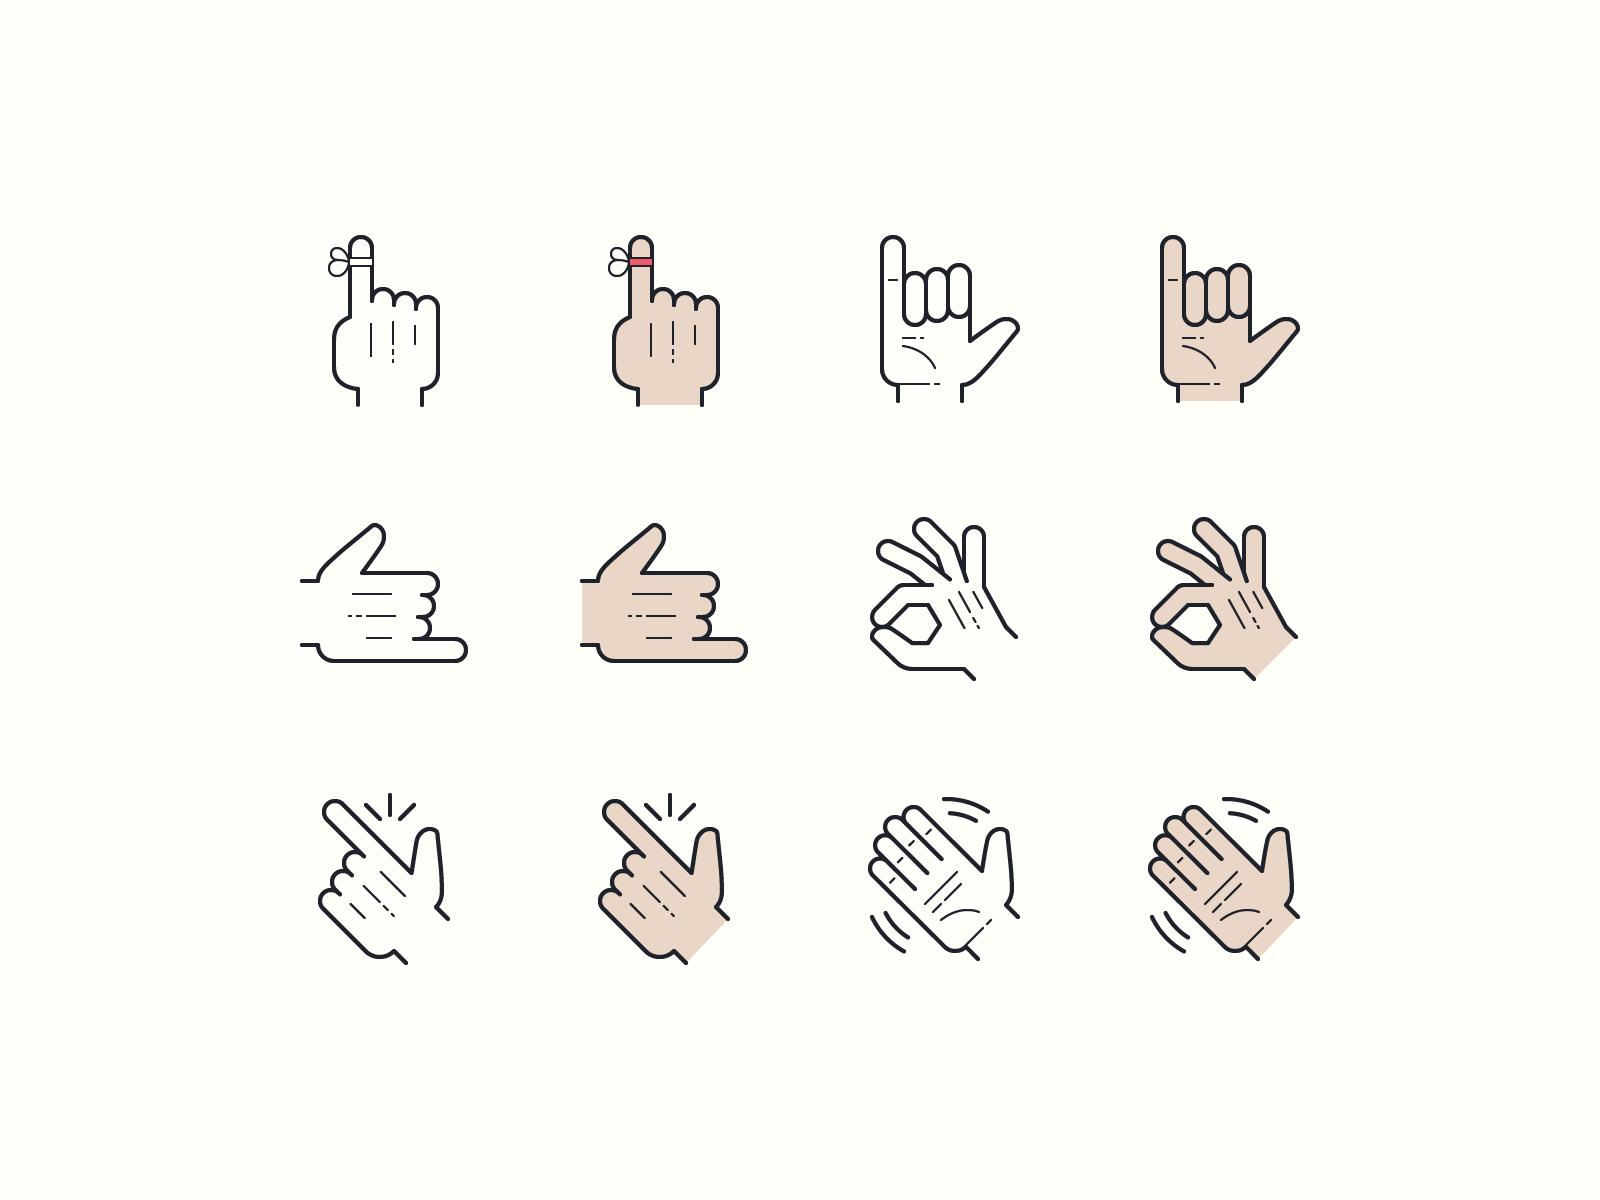 gestures hands icons